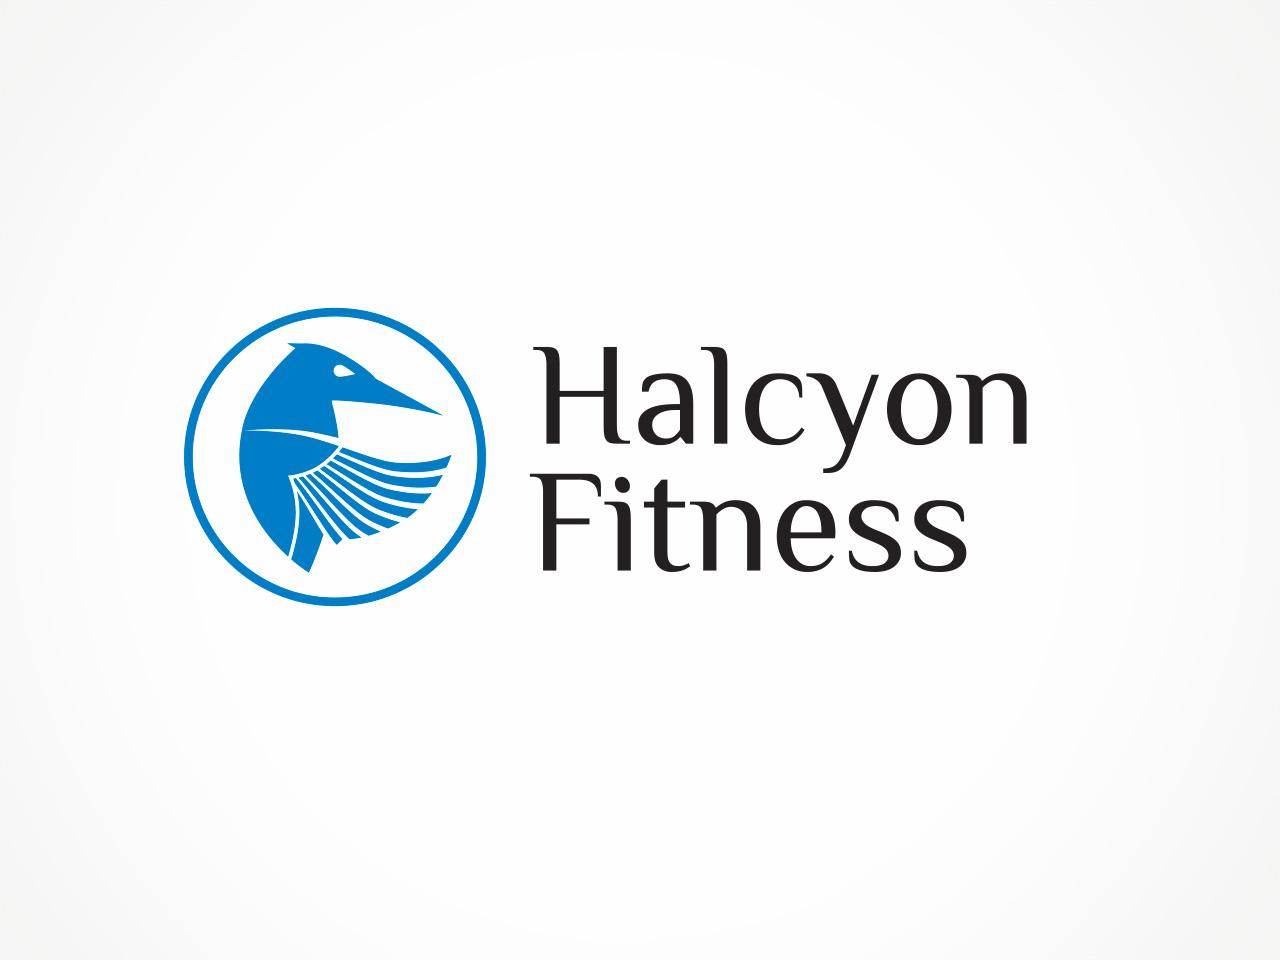 Halcyon Fitness logo